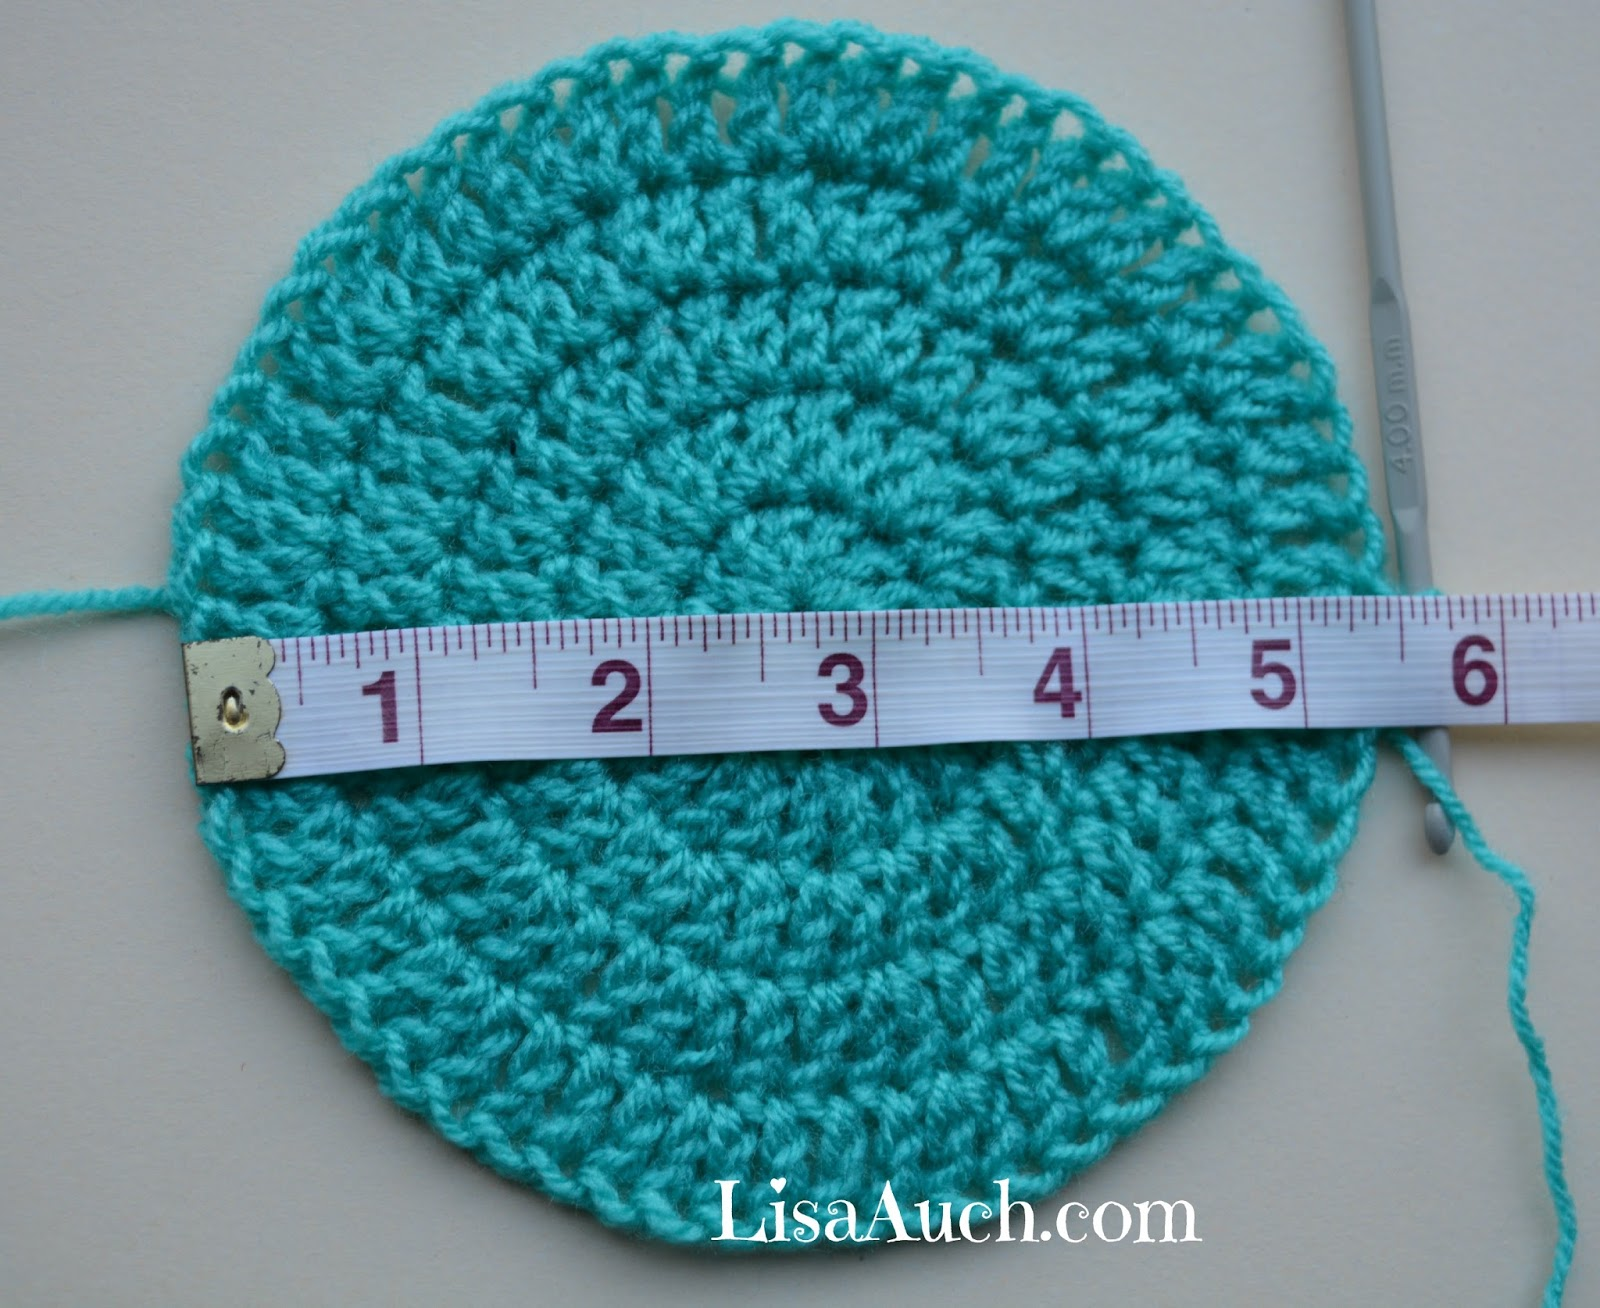 crochet baby beanie pattern free crochet baby beanie hat pattern 6-12 months HXECUTZ